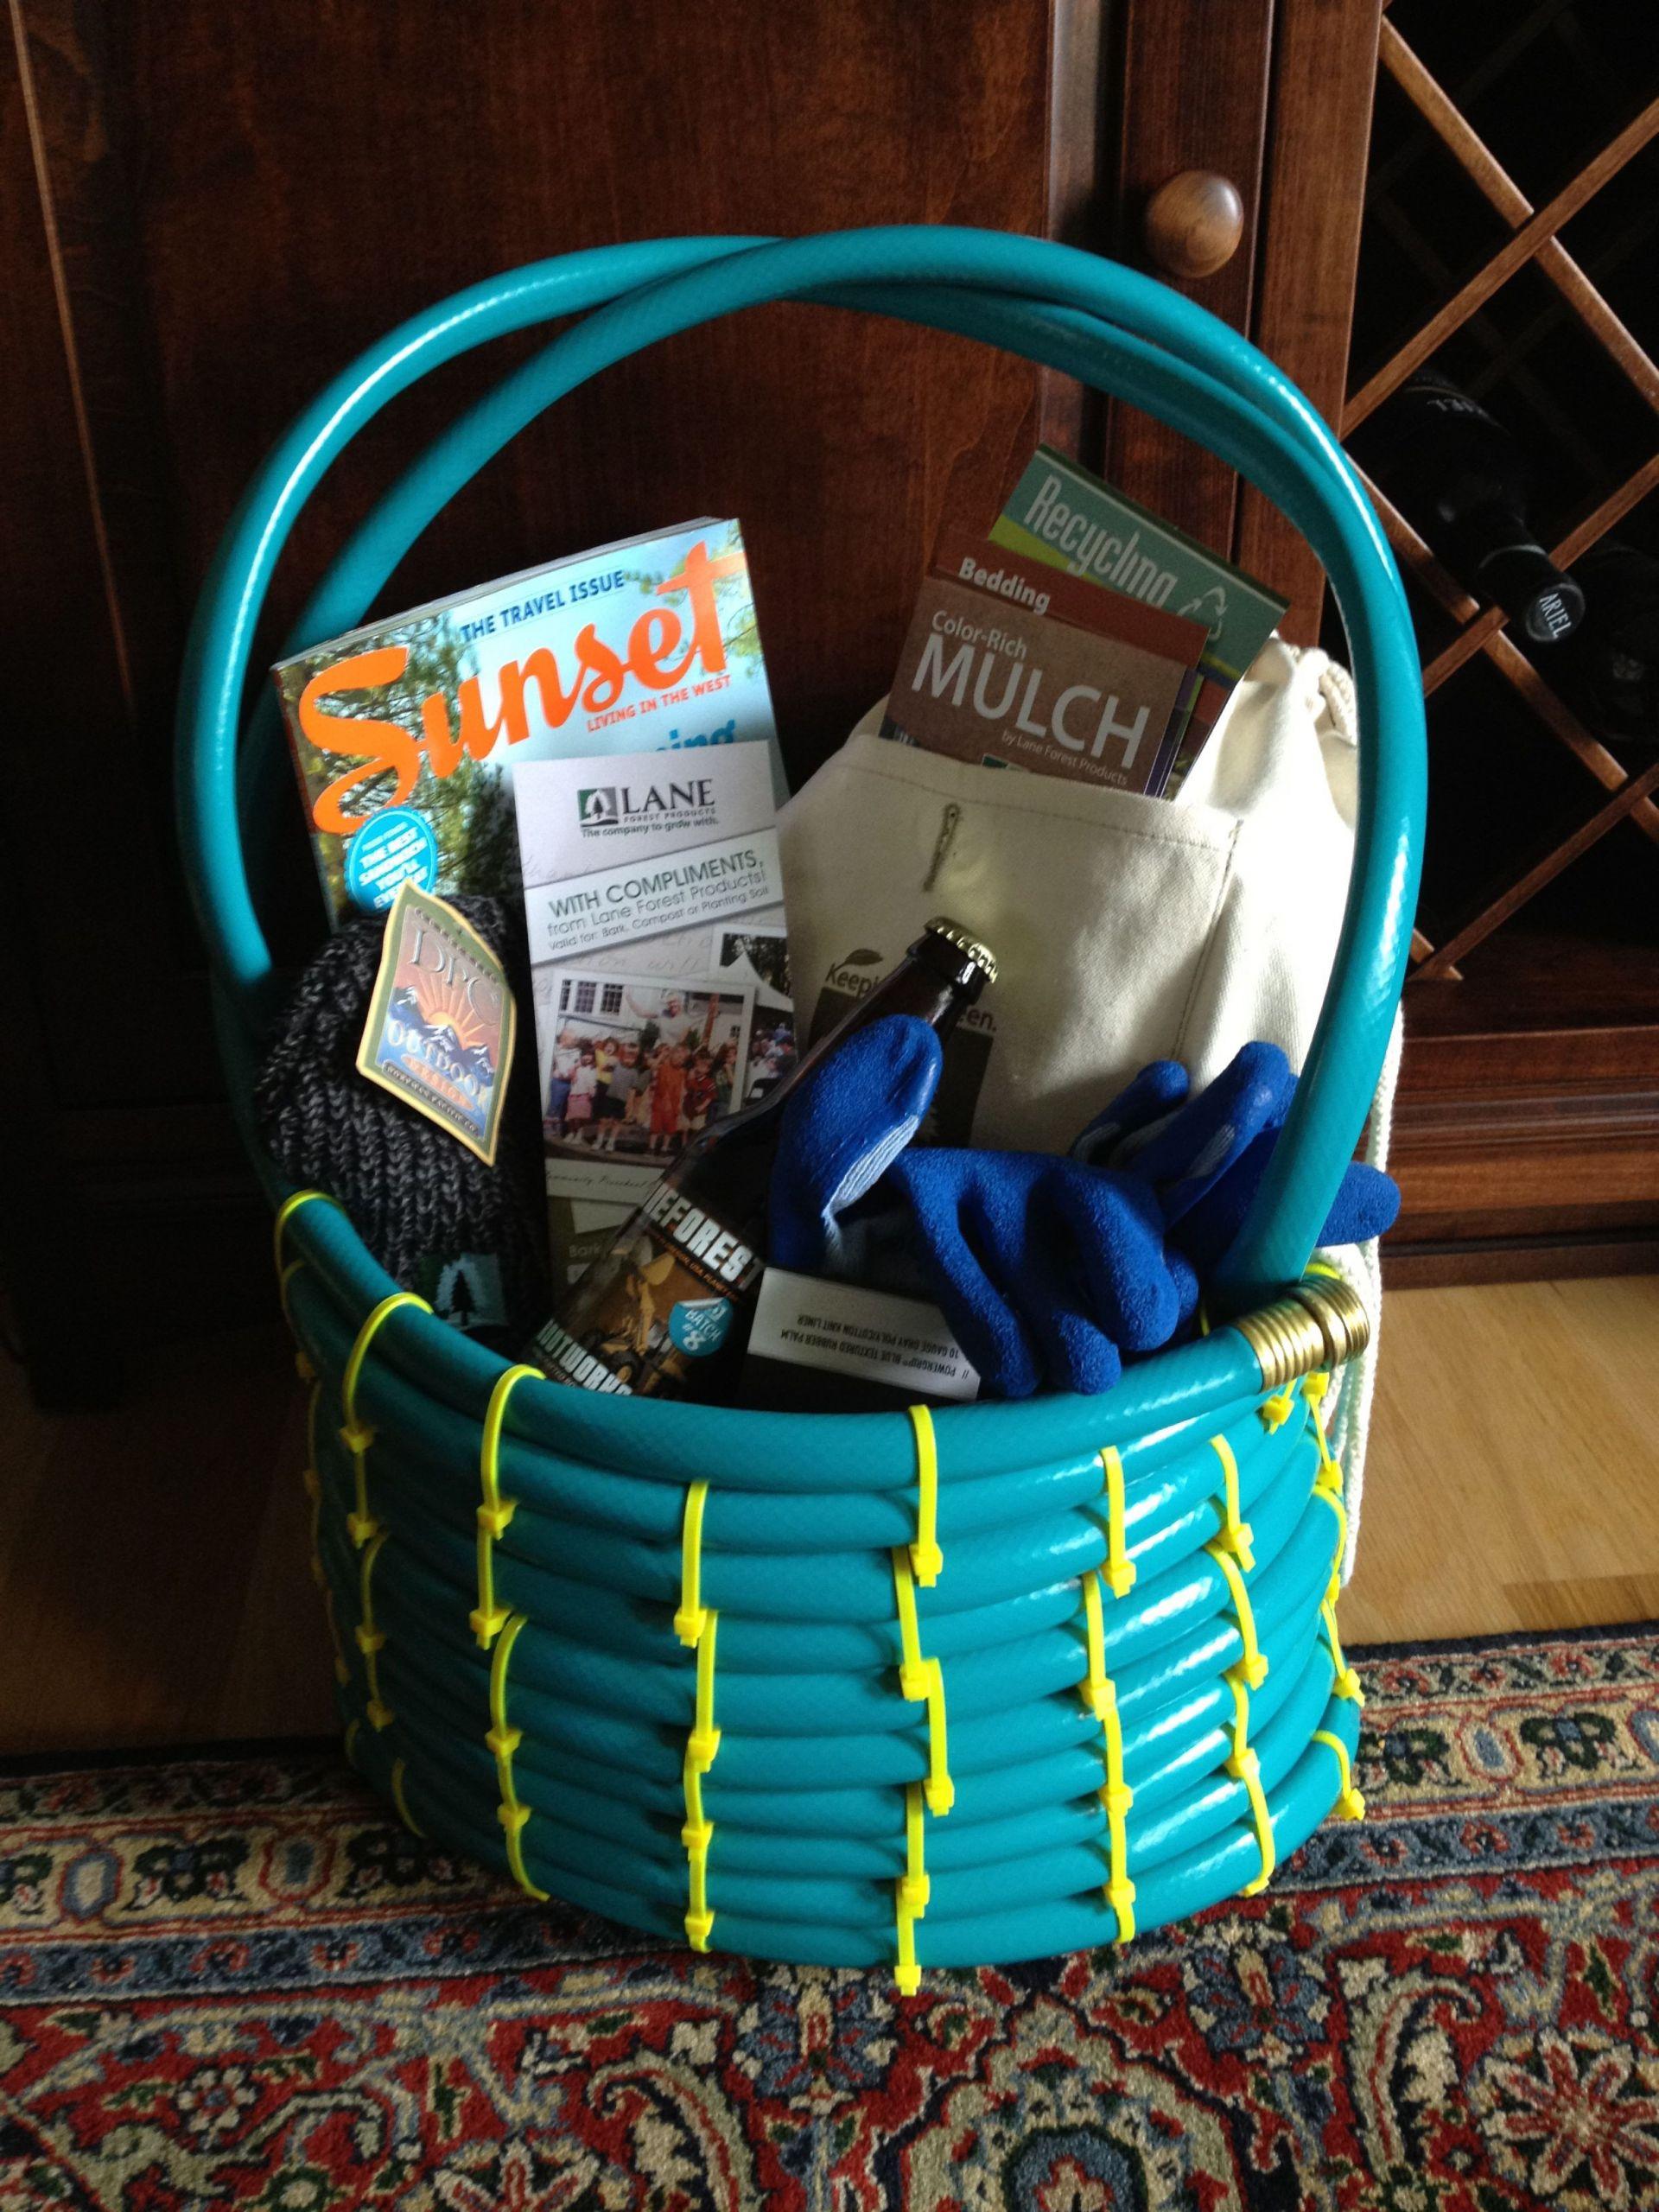 Garden Themed Gift Basket Ideas  Garden Hose Gift Basket Great idea from Proven Winners